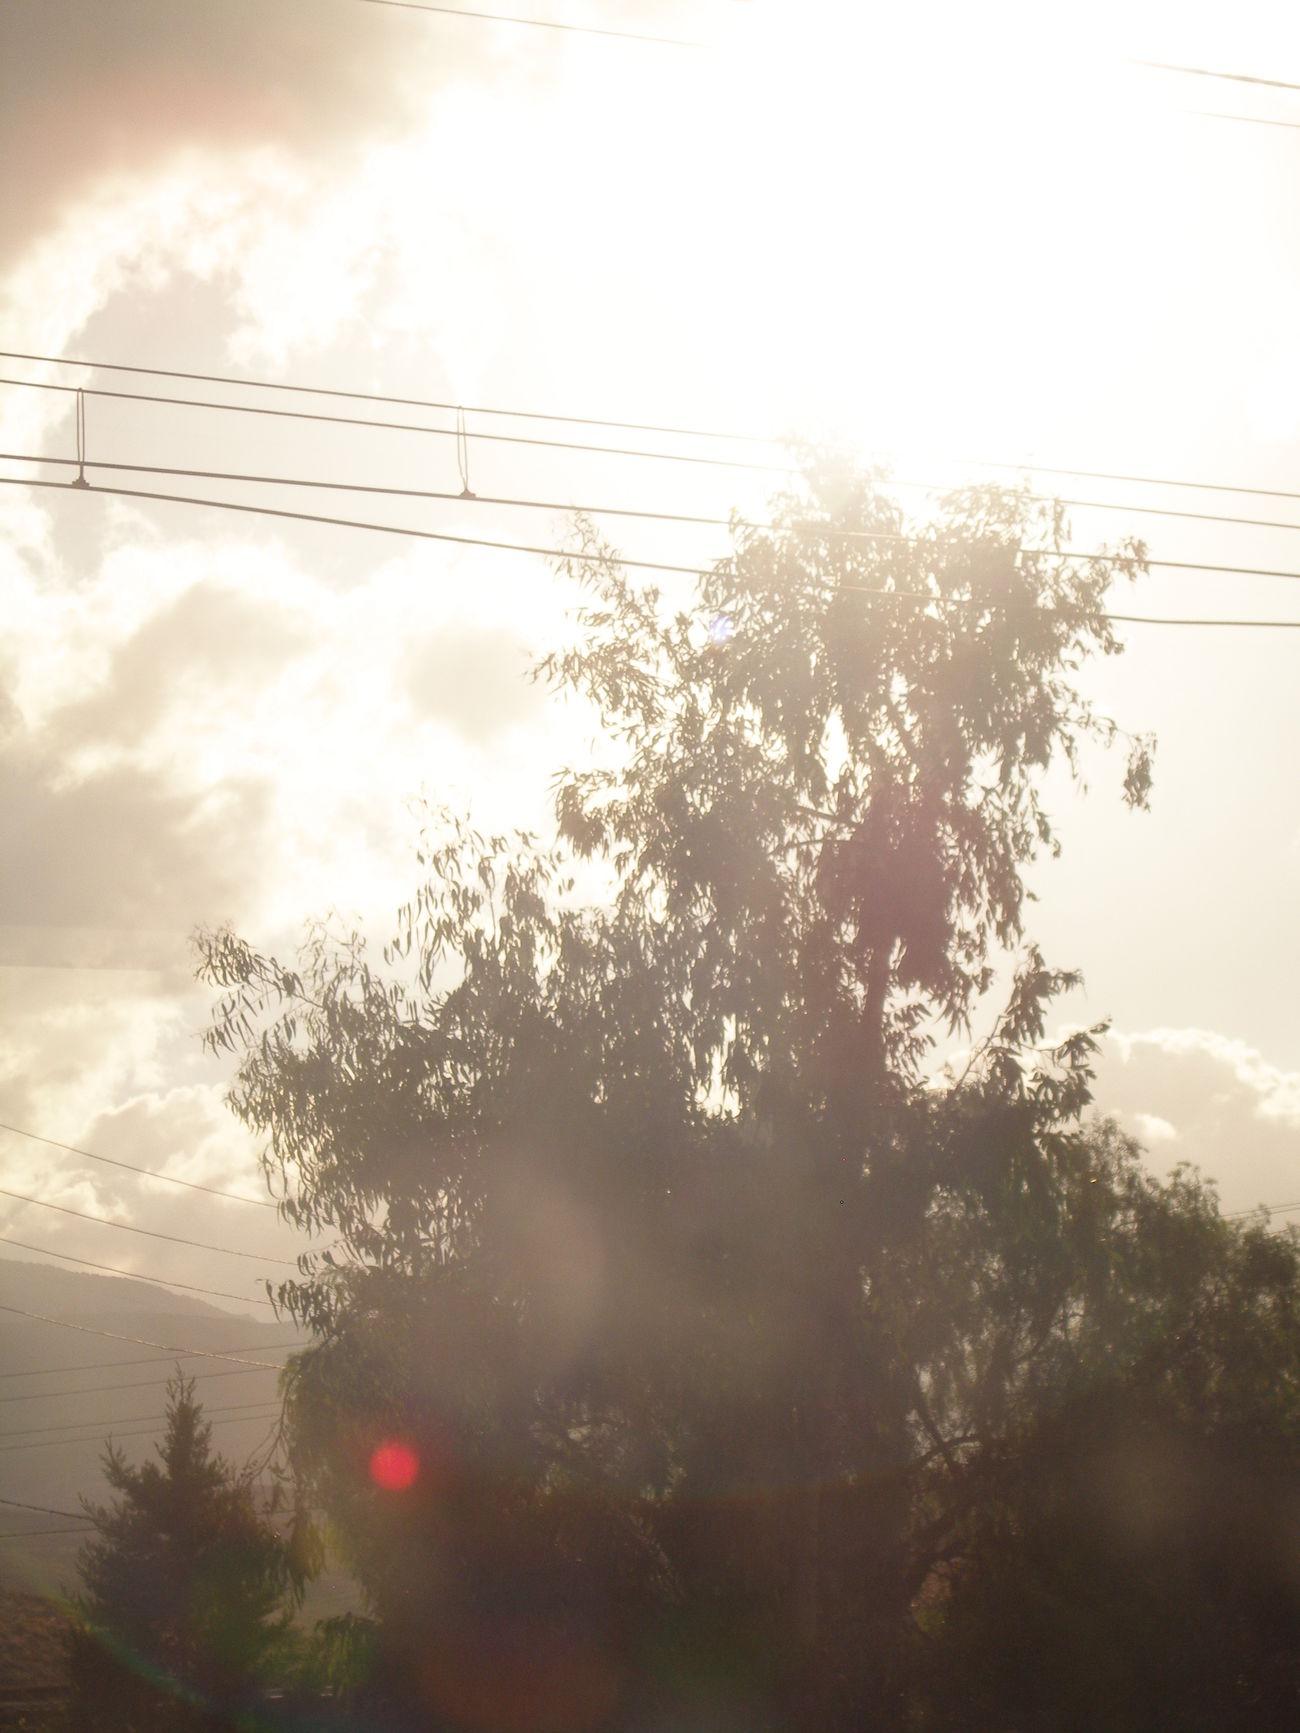 Suena 🎶🎧 Páginas tuyas. Fabián Tree árbol Viajar Travel Train Tren Vistas View Ventana Ventanilla Window Tesis99 White Blanco Luz Light Antenas Tranquilidad Tranquility Trayecto Route Destello Flare Blurred Transport